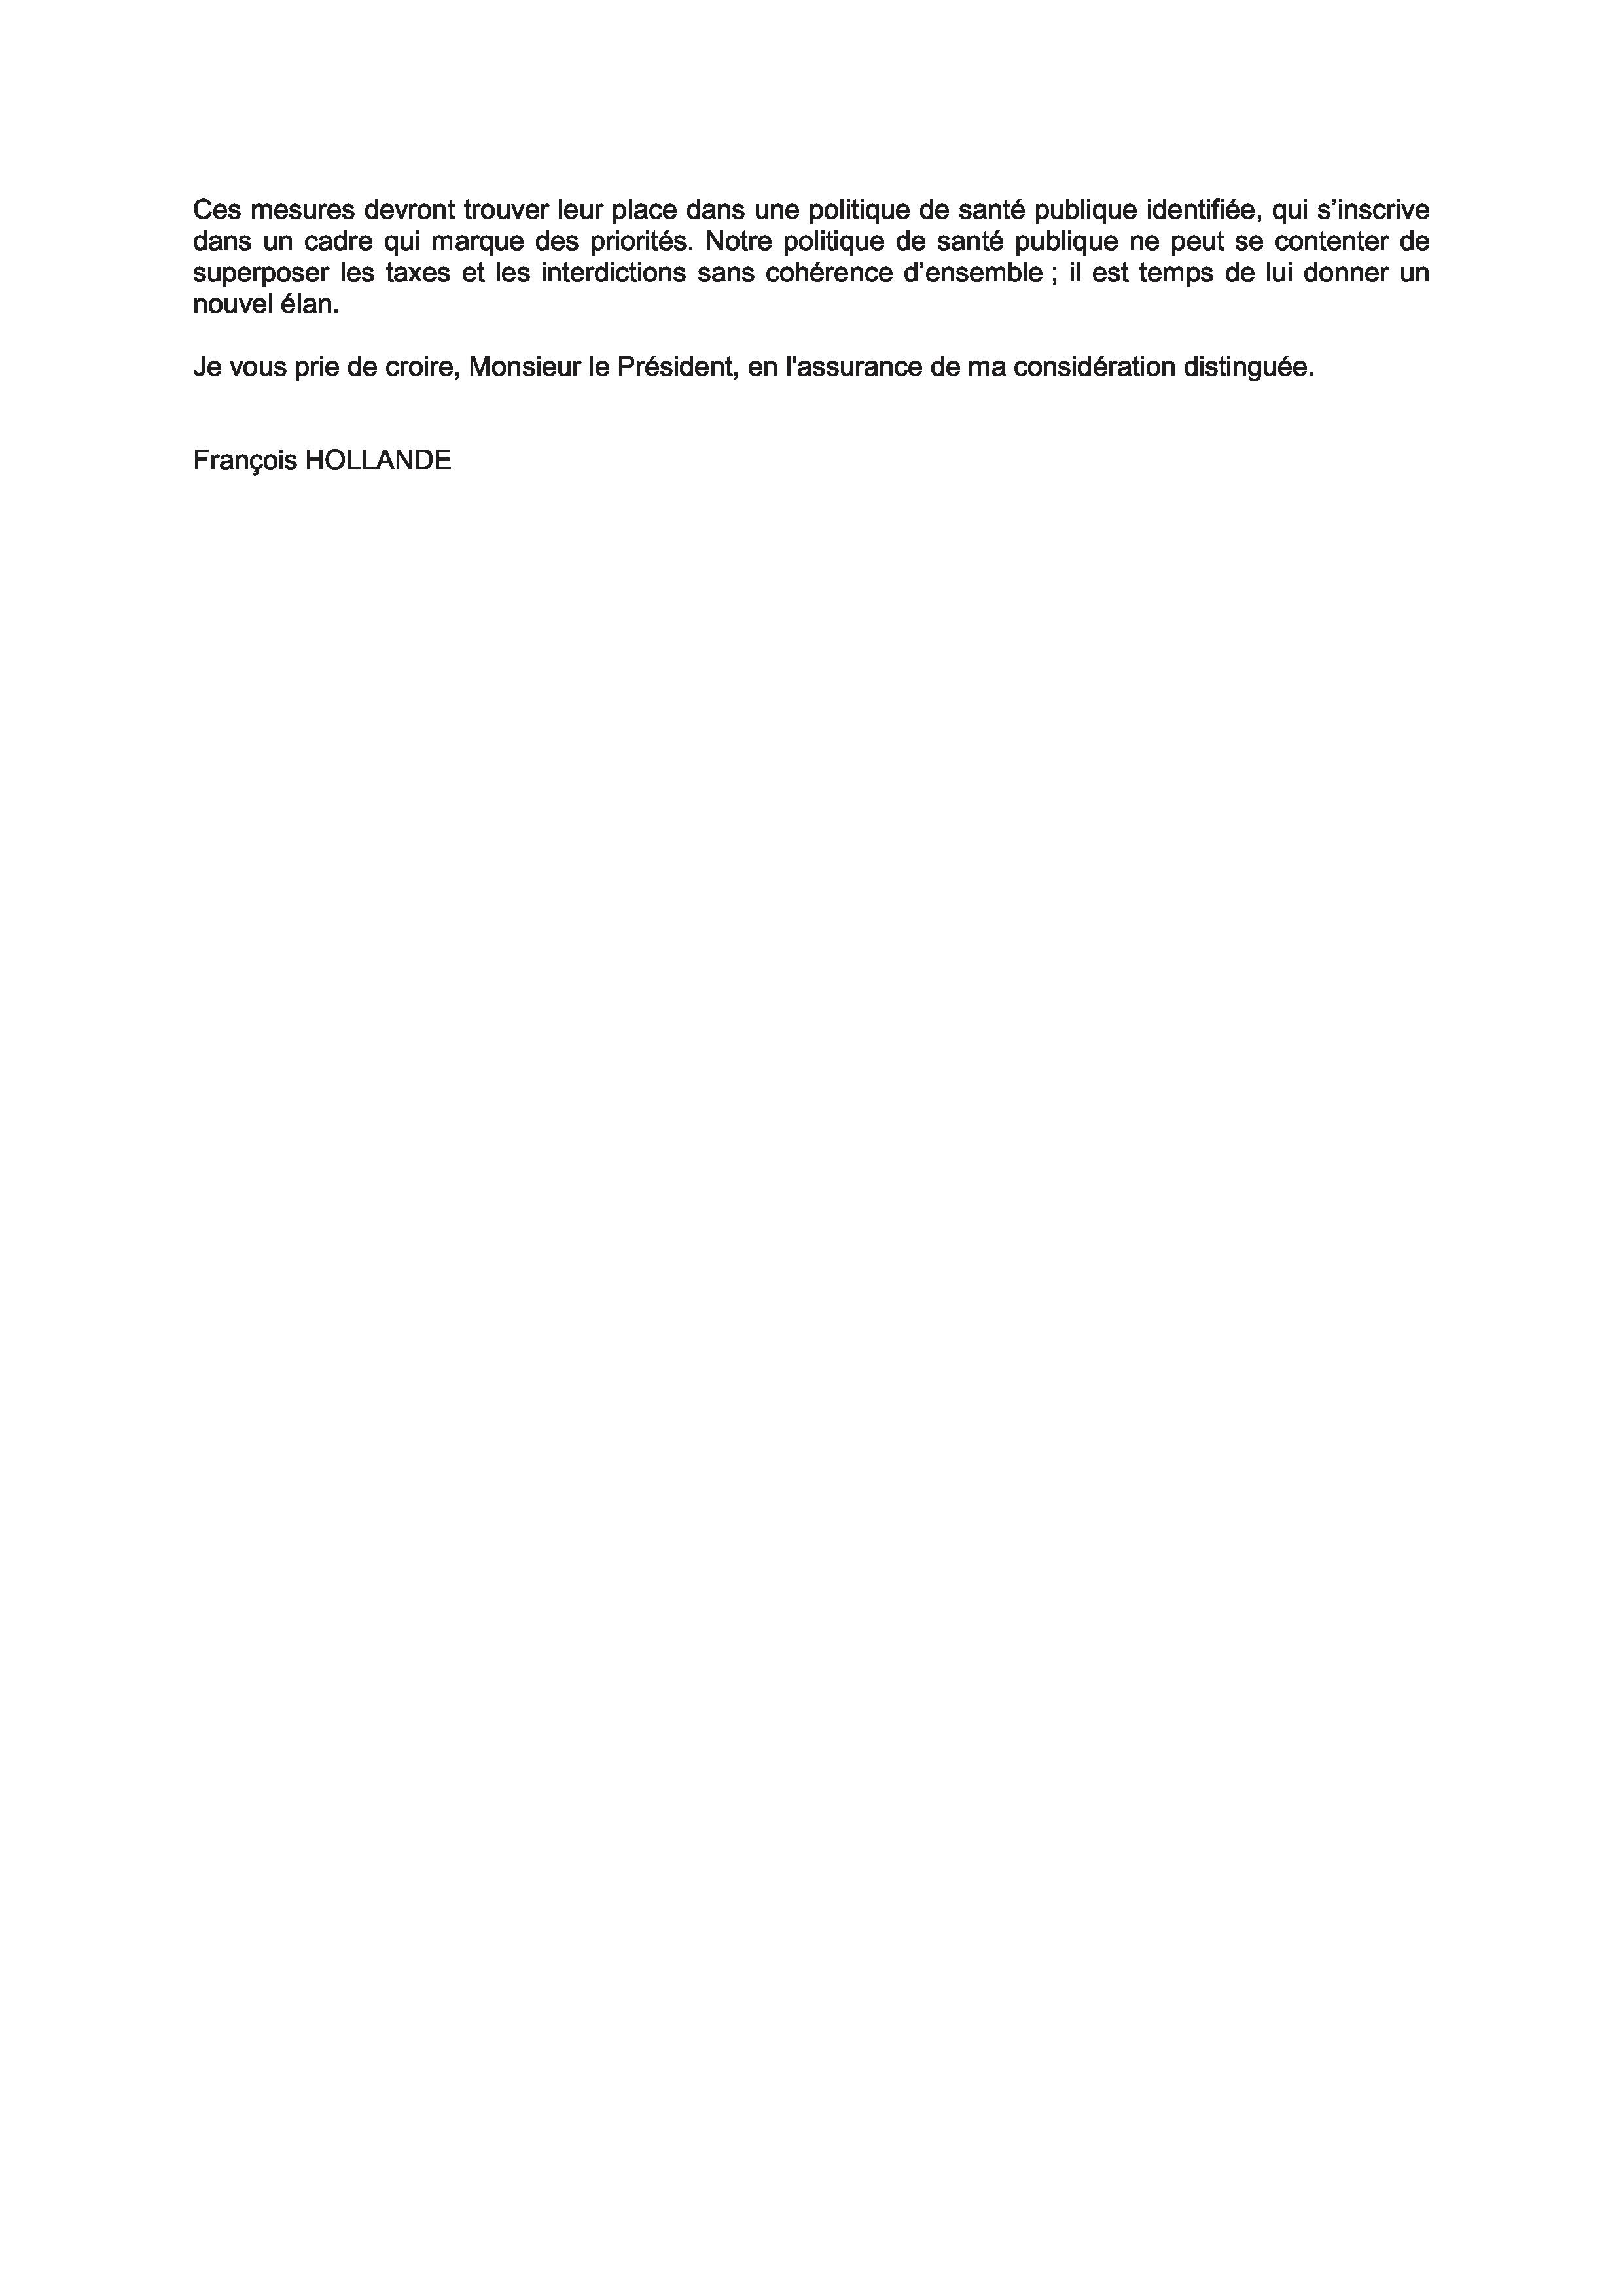 Alliance-dossier-presse-livre-blanc-11avr2012_Page_18.jpg